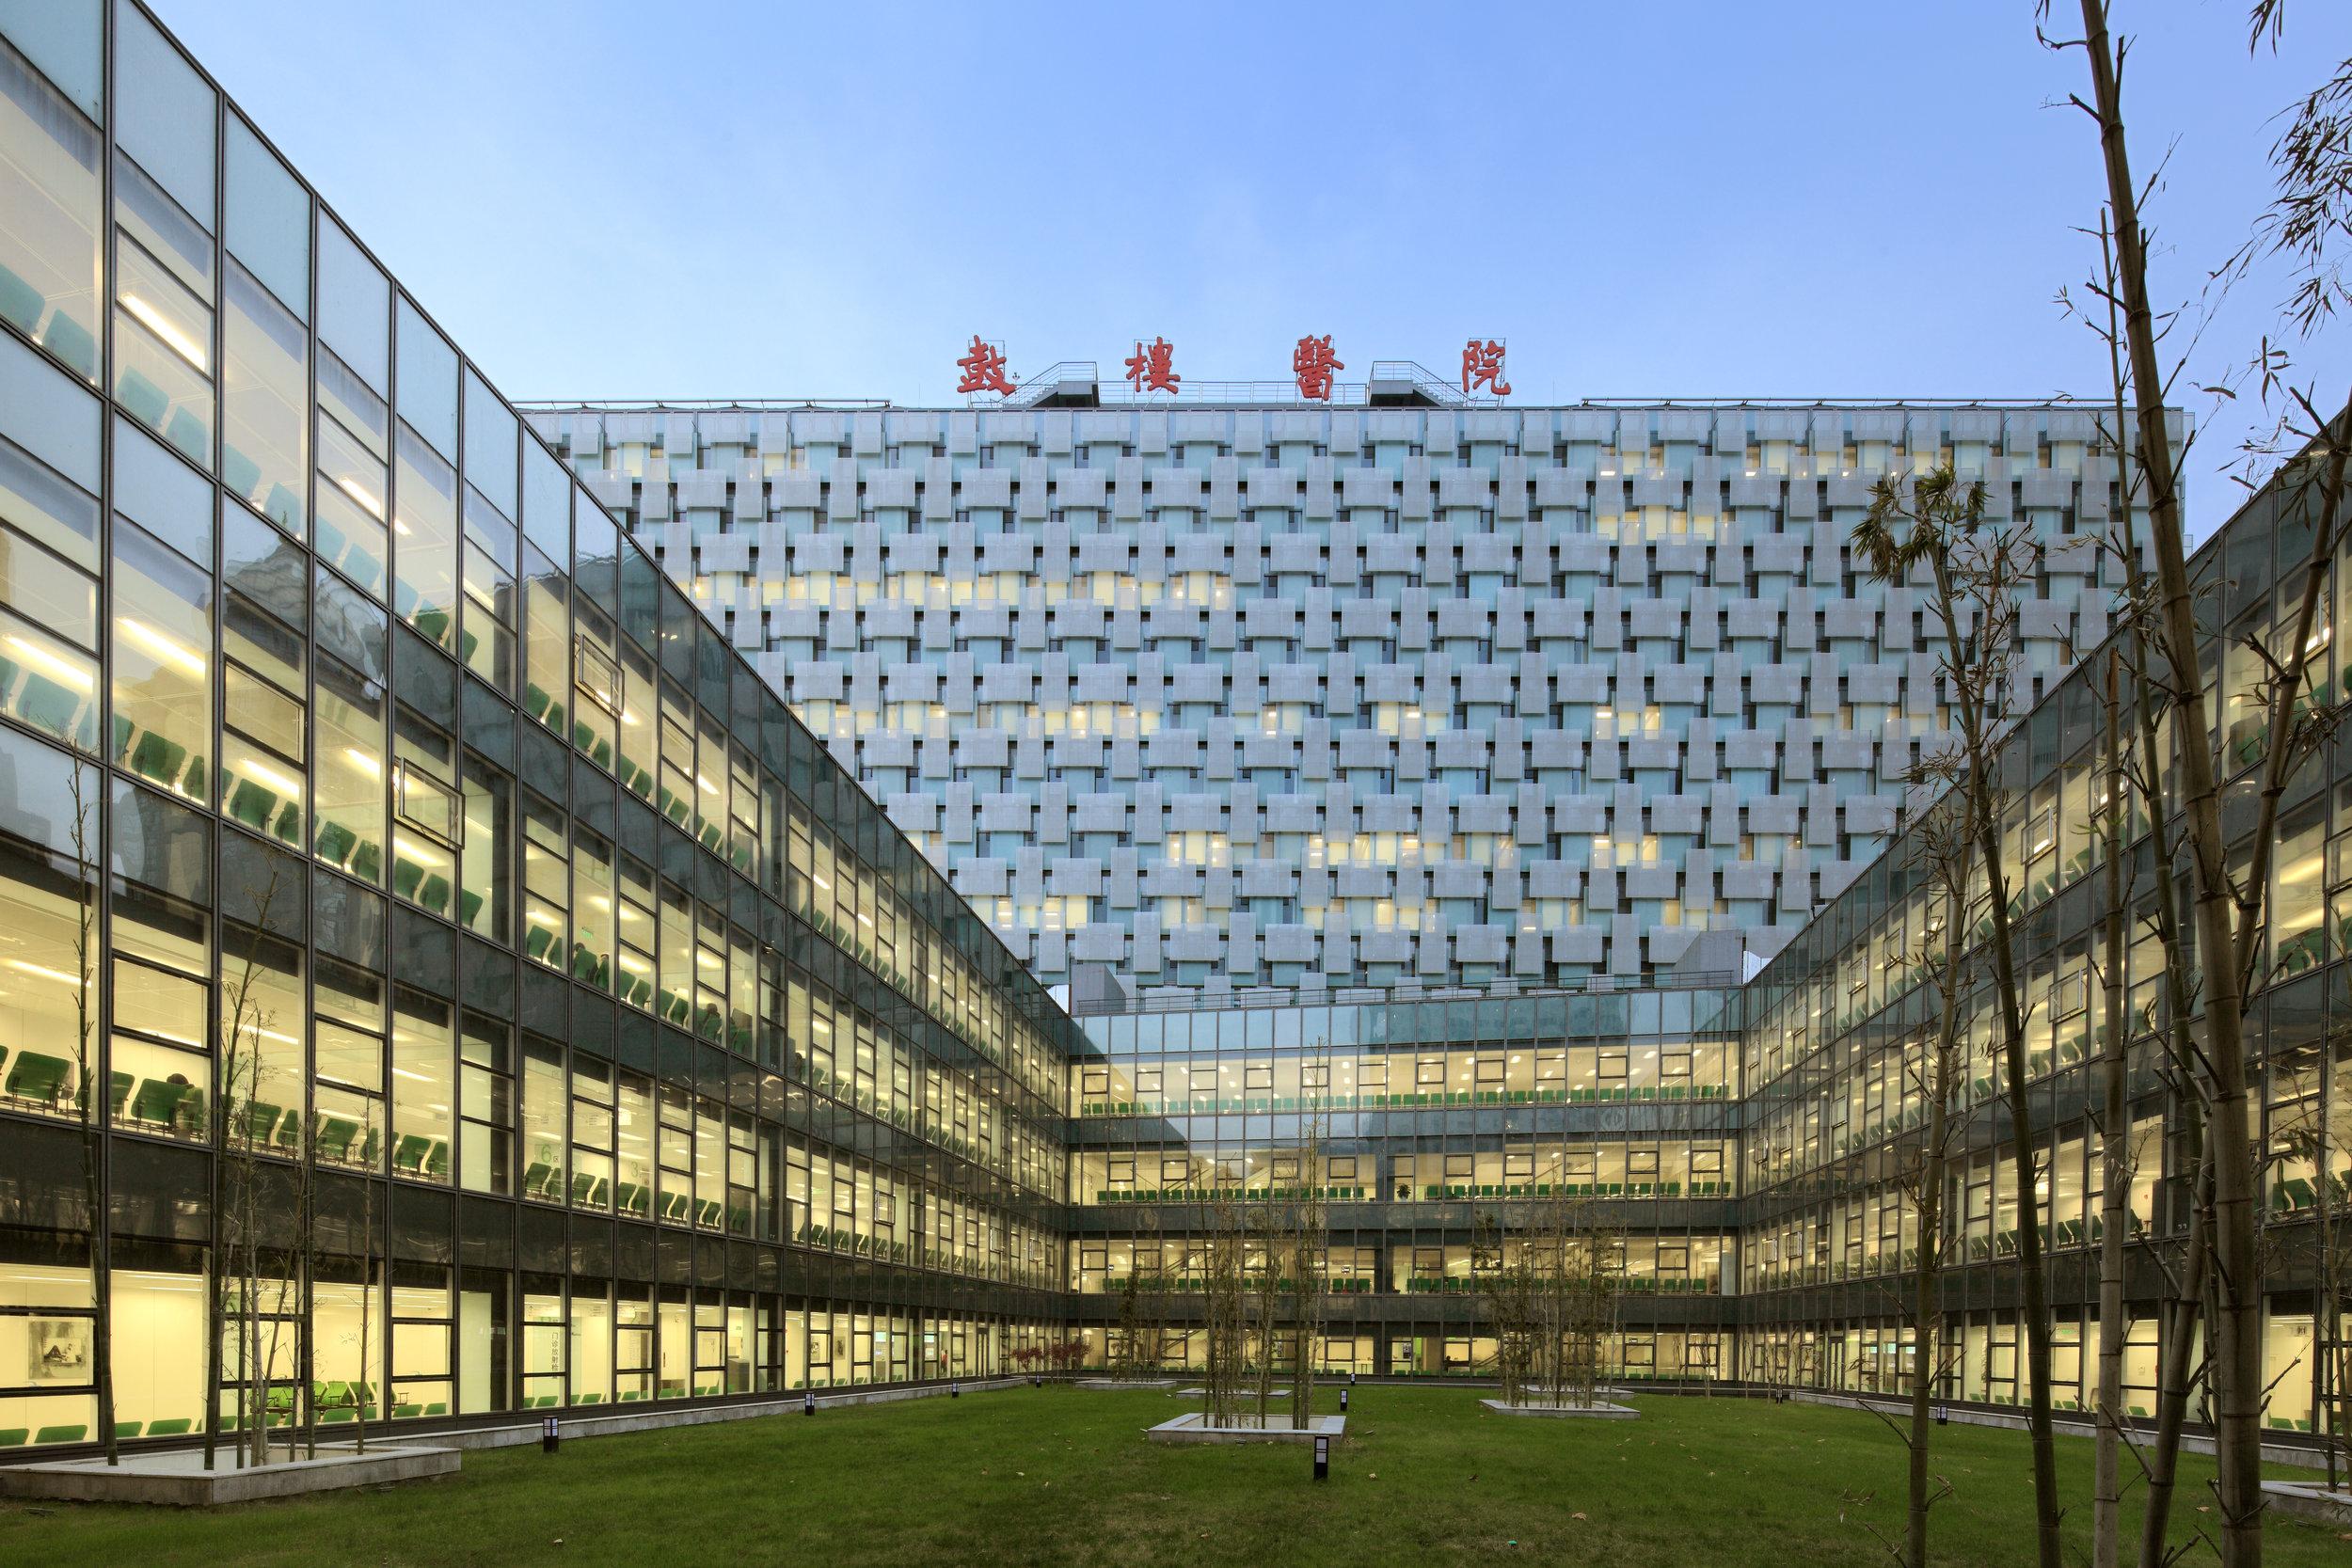 Nanjing Drum Tower Hospital  Nanjing, china